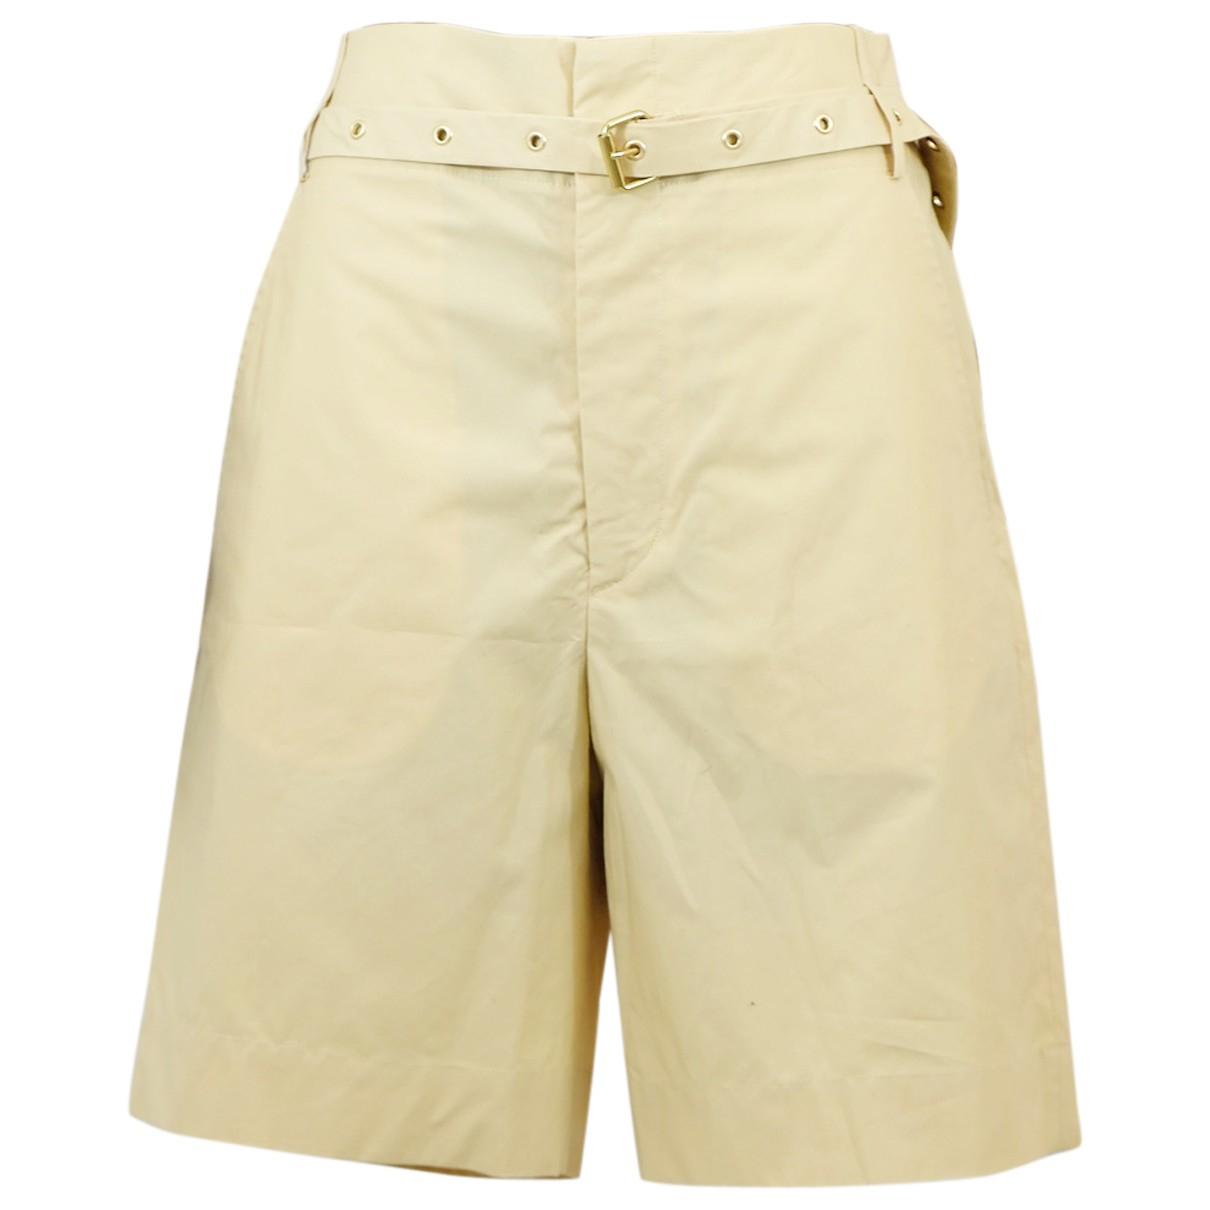 Isabel Marant N Beige Cotton Shorts for Women M International